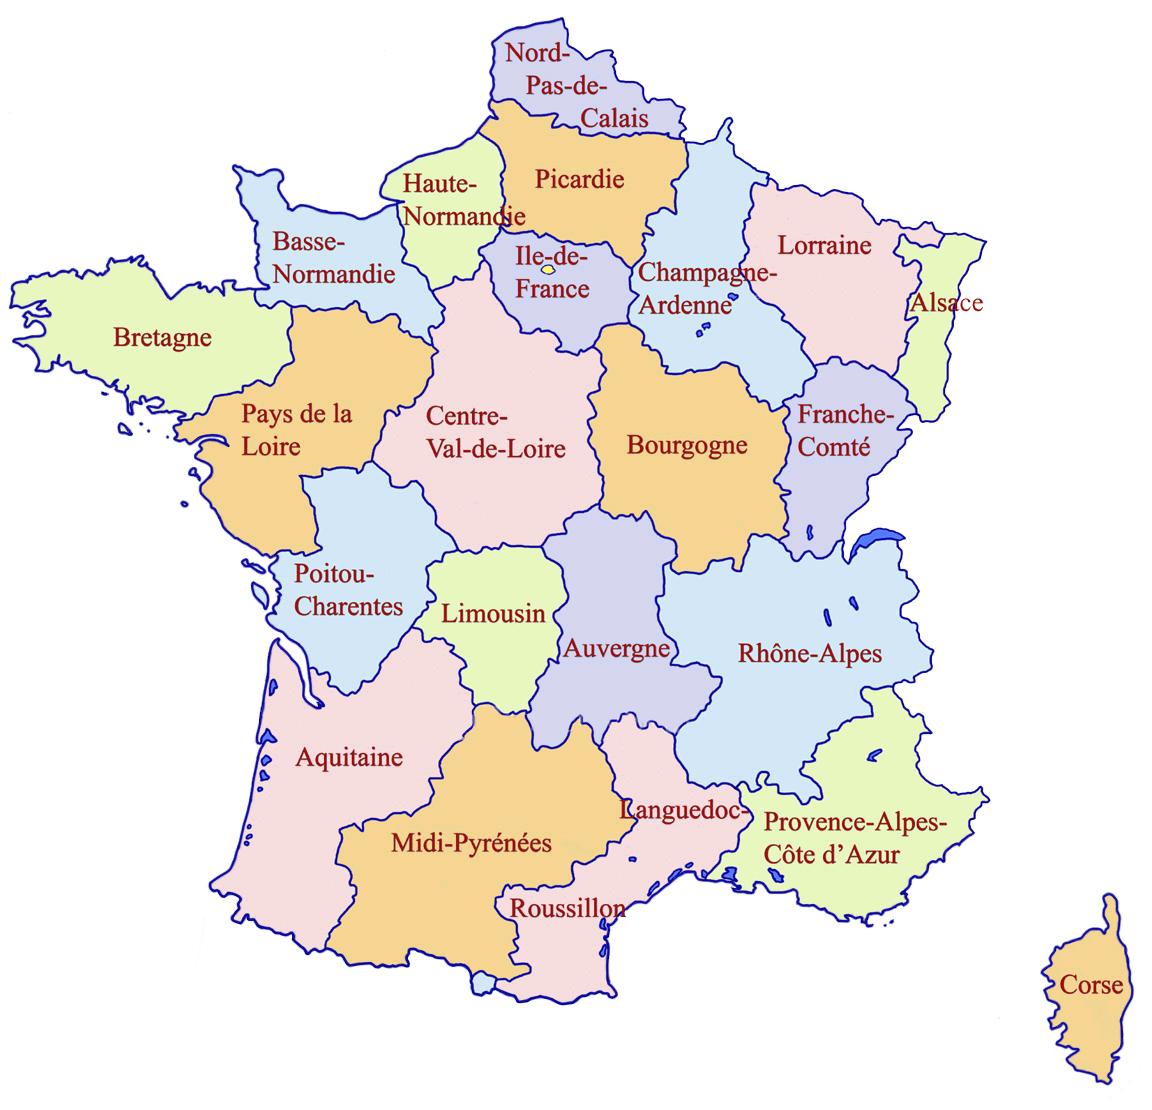 Dipartimenti Francia Cartina.La Nostra Francia Mini Guida Hotel Chalets E Residence